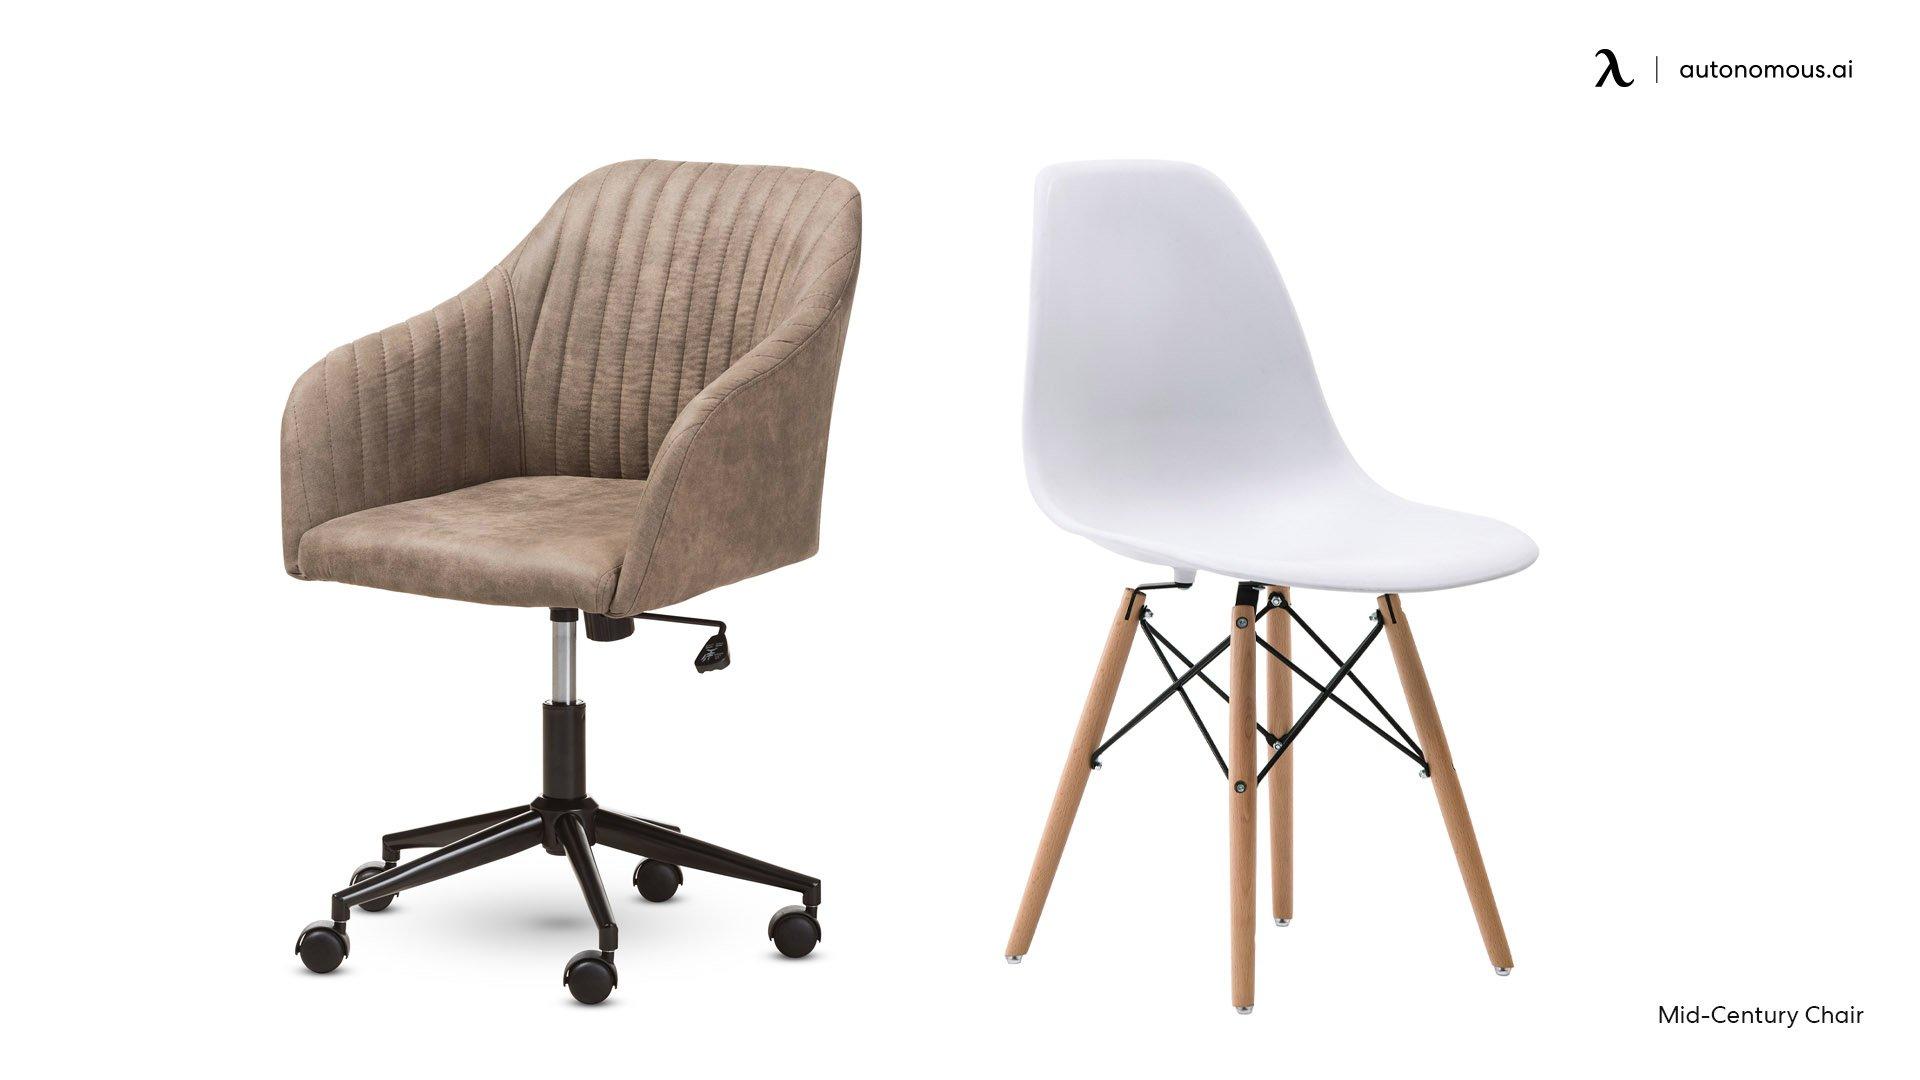 Photo of Mid-Century Chair